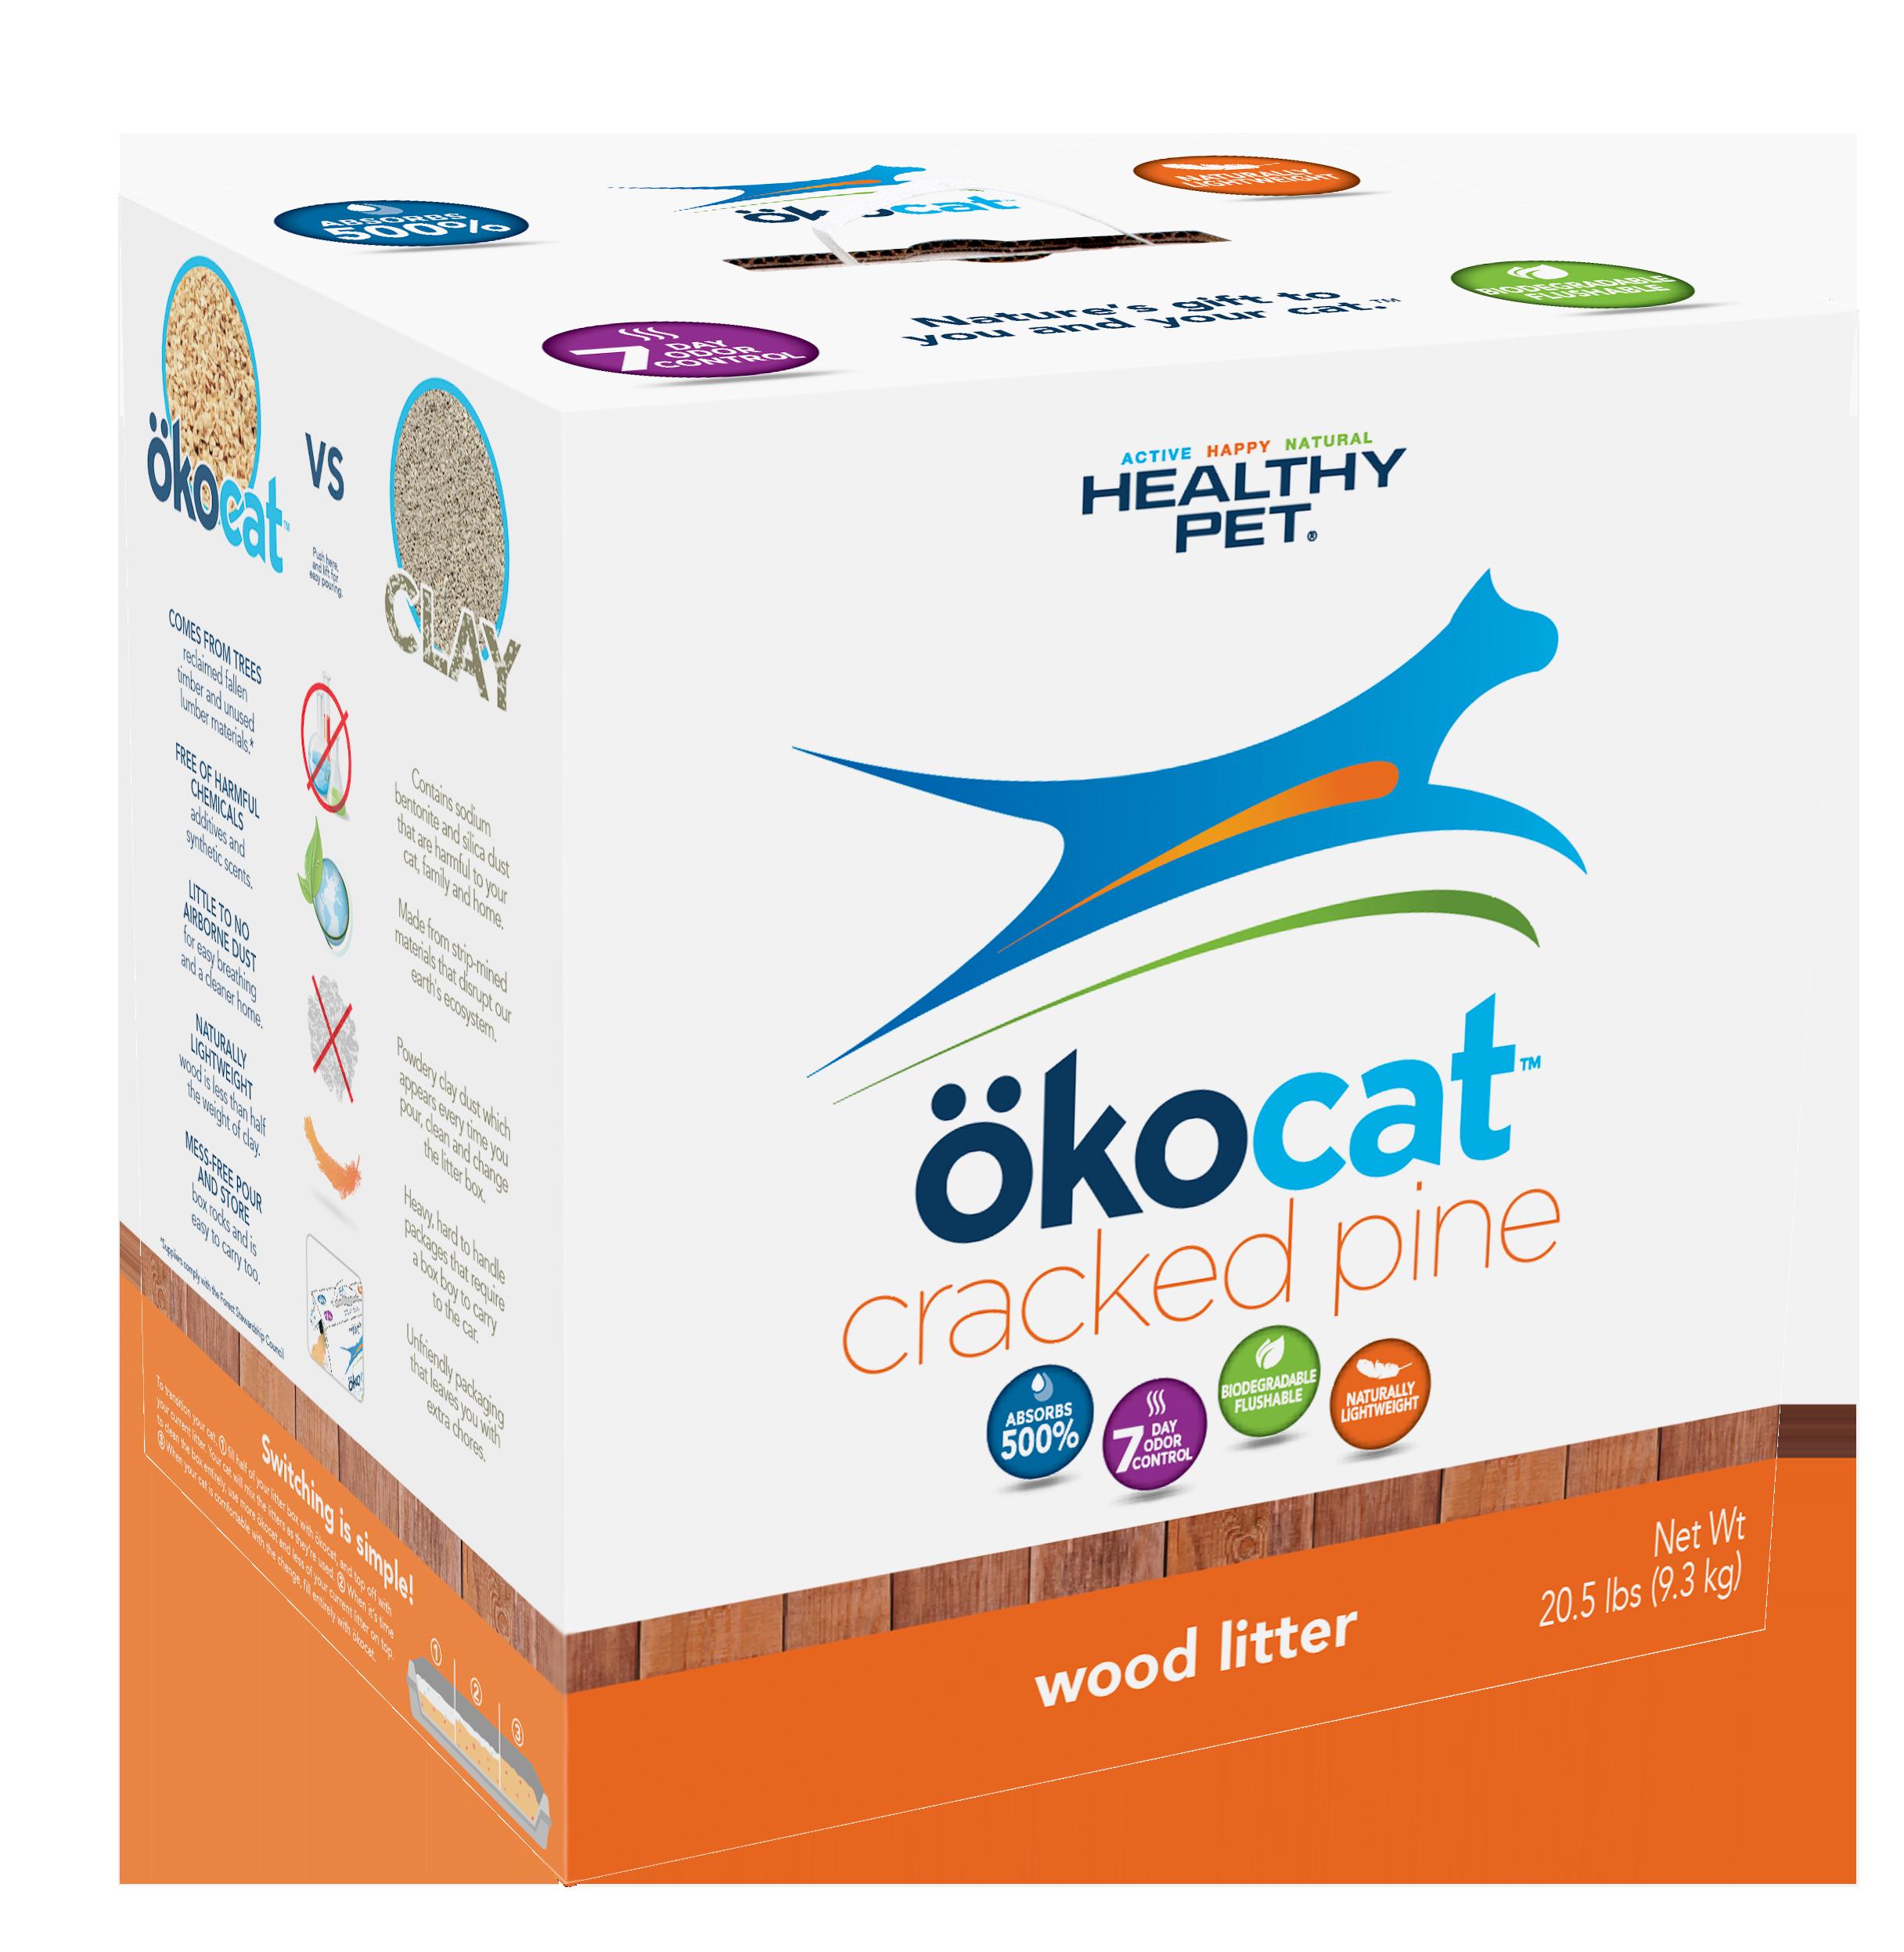 Okocat Cracked Pine Wood Cat Litter, 20.5-lb